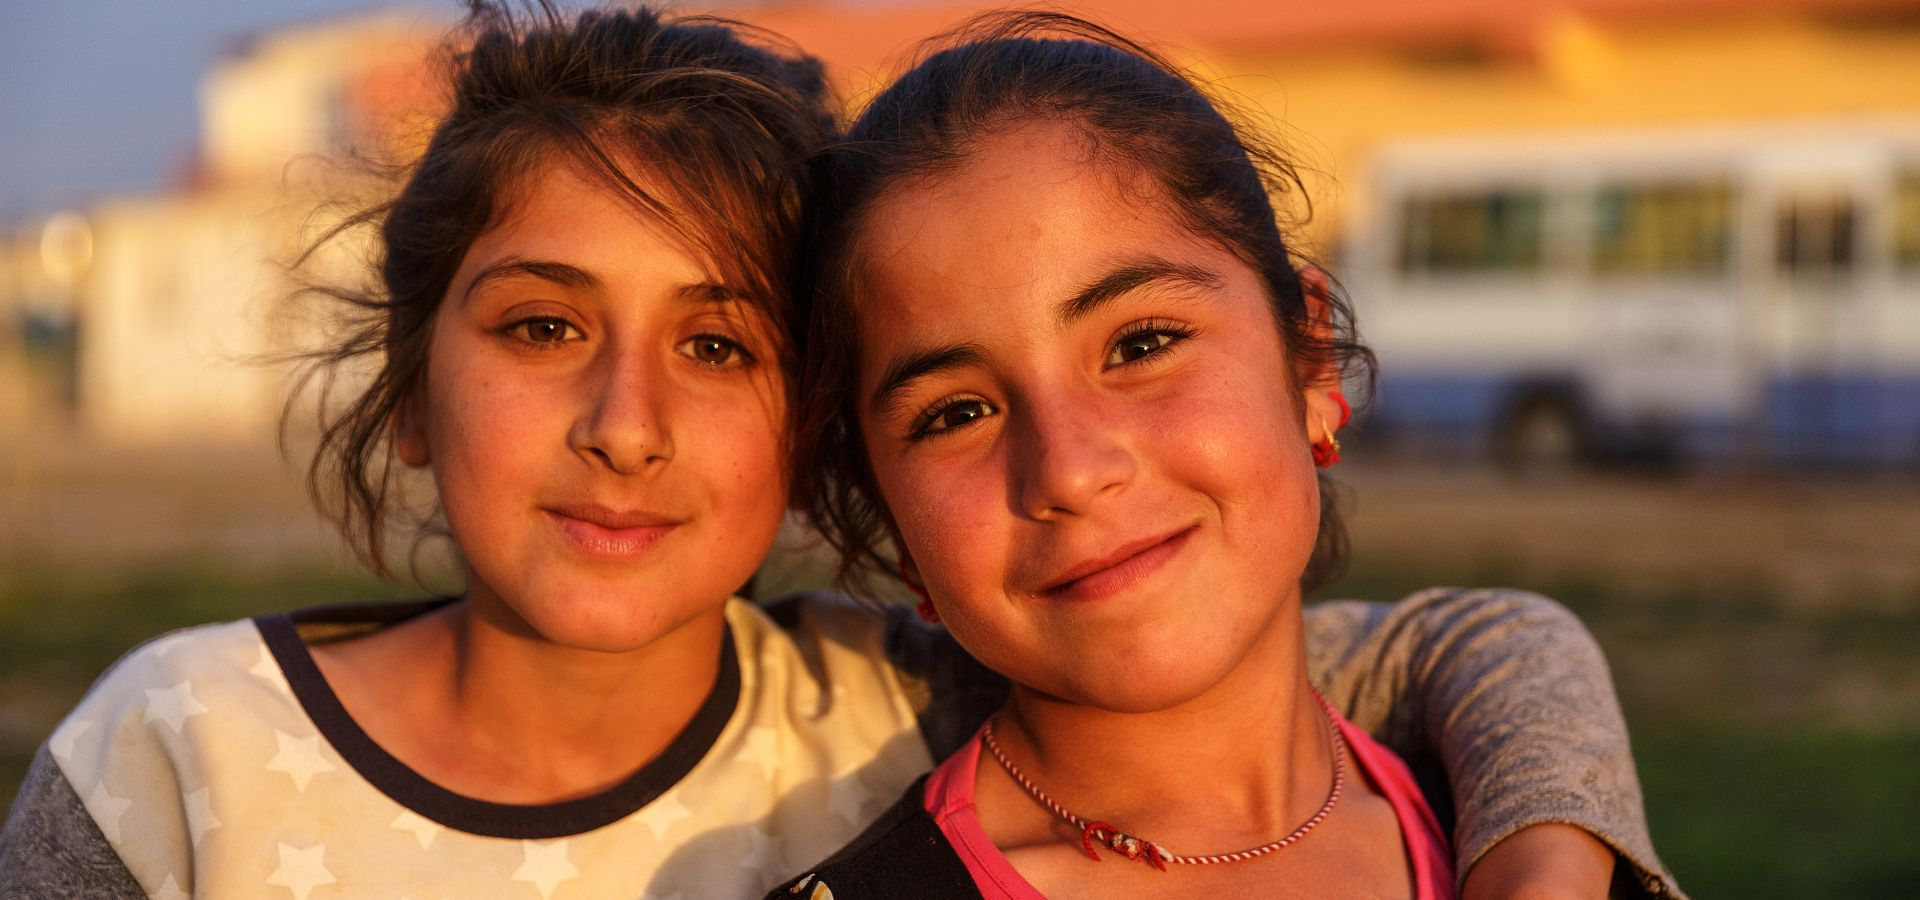 09-Irak